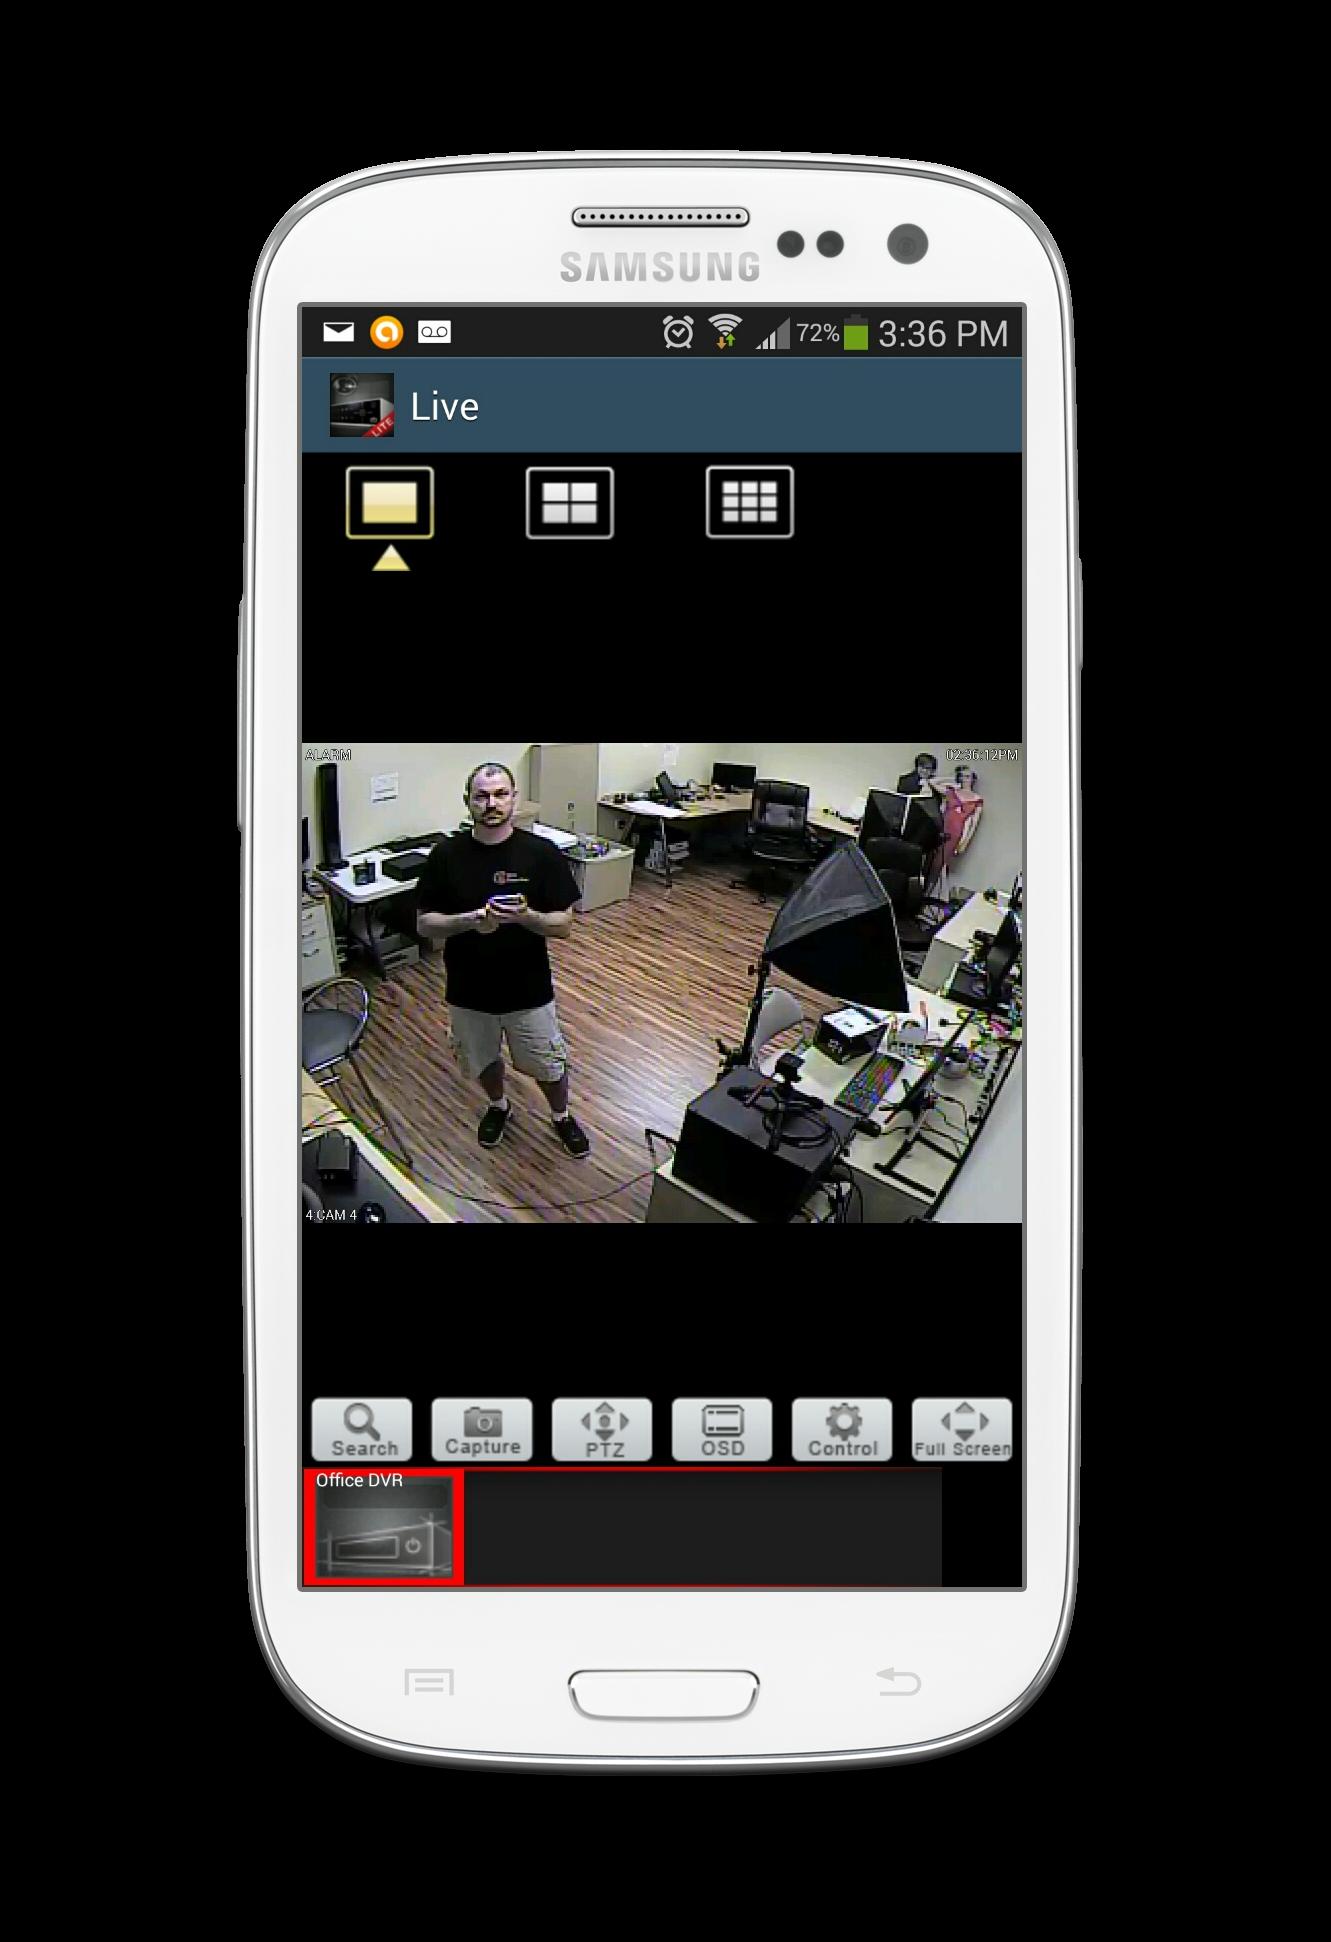 Iphone Video Surveillance Cameras